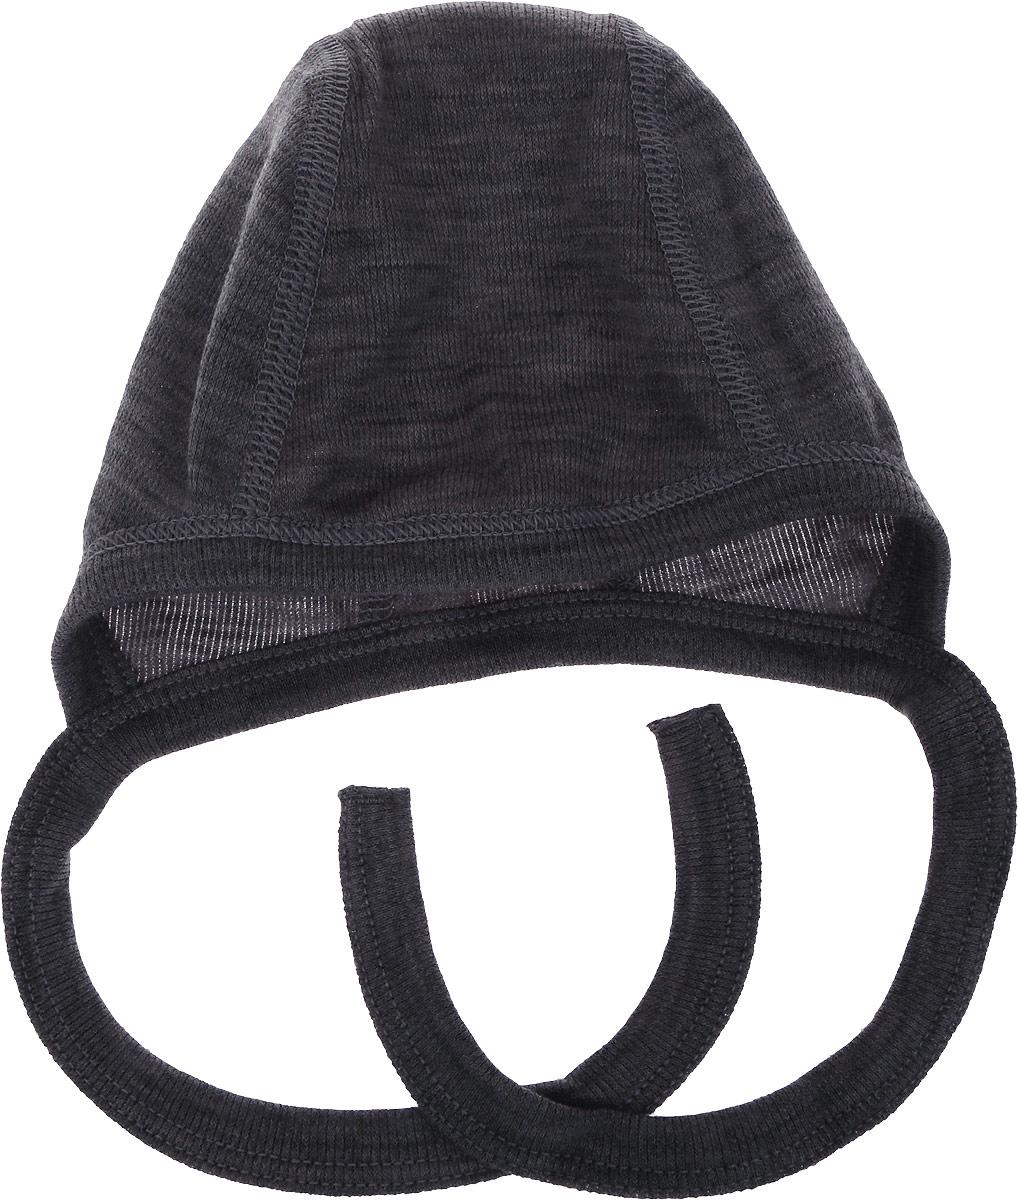 Чепчик для новорожденного Dr. Wool, цвет: серый меланж. DWKL 310. Размер 35/40